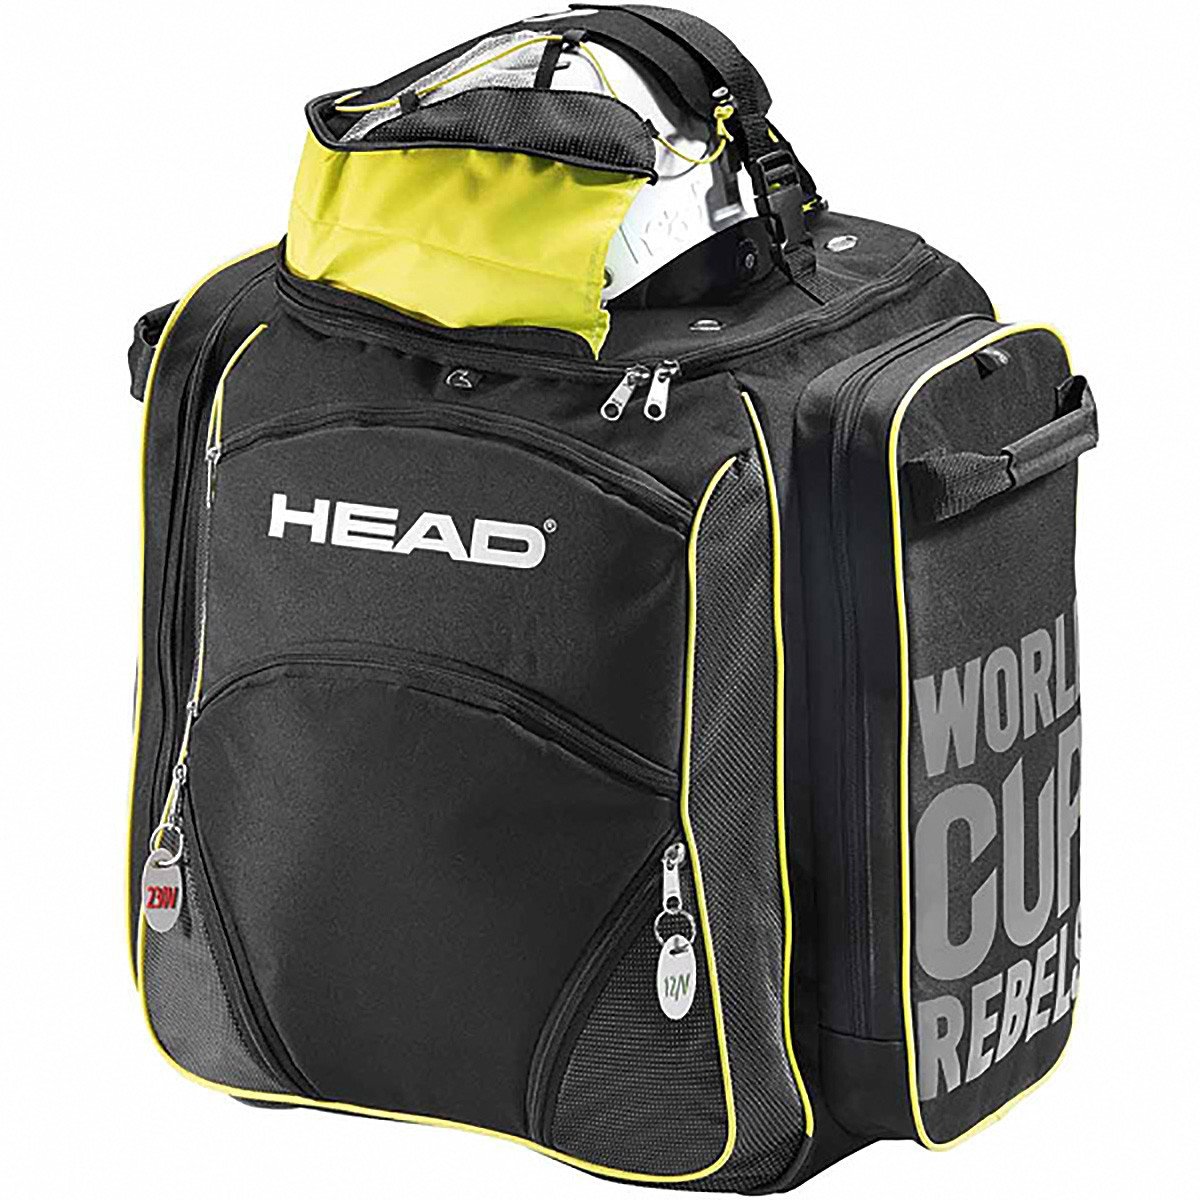 sac dos pour chaussures head heatable accessoires ski. Black Bedroom Furniture Sets. Home Design Ideas